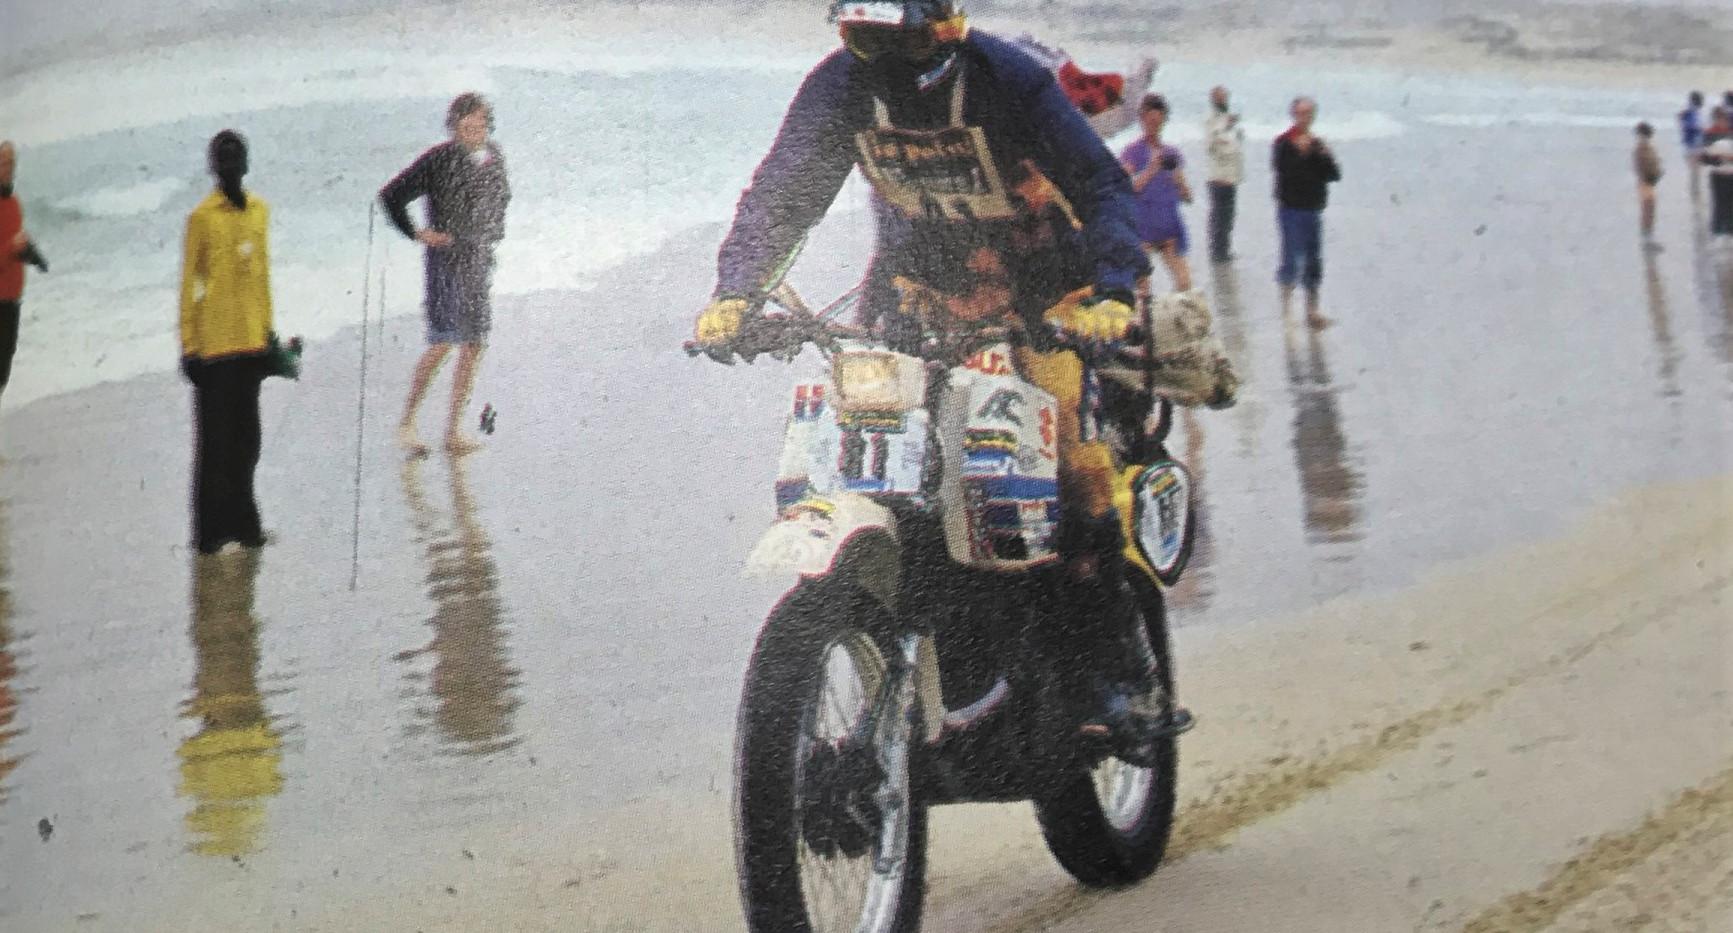 1982-Dakar-Goal-001.jpg